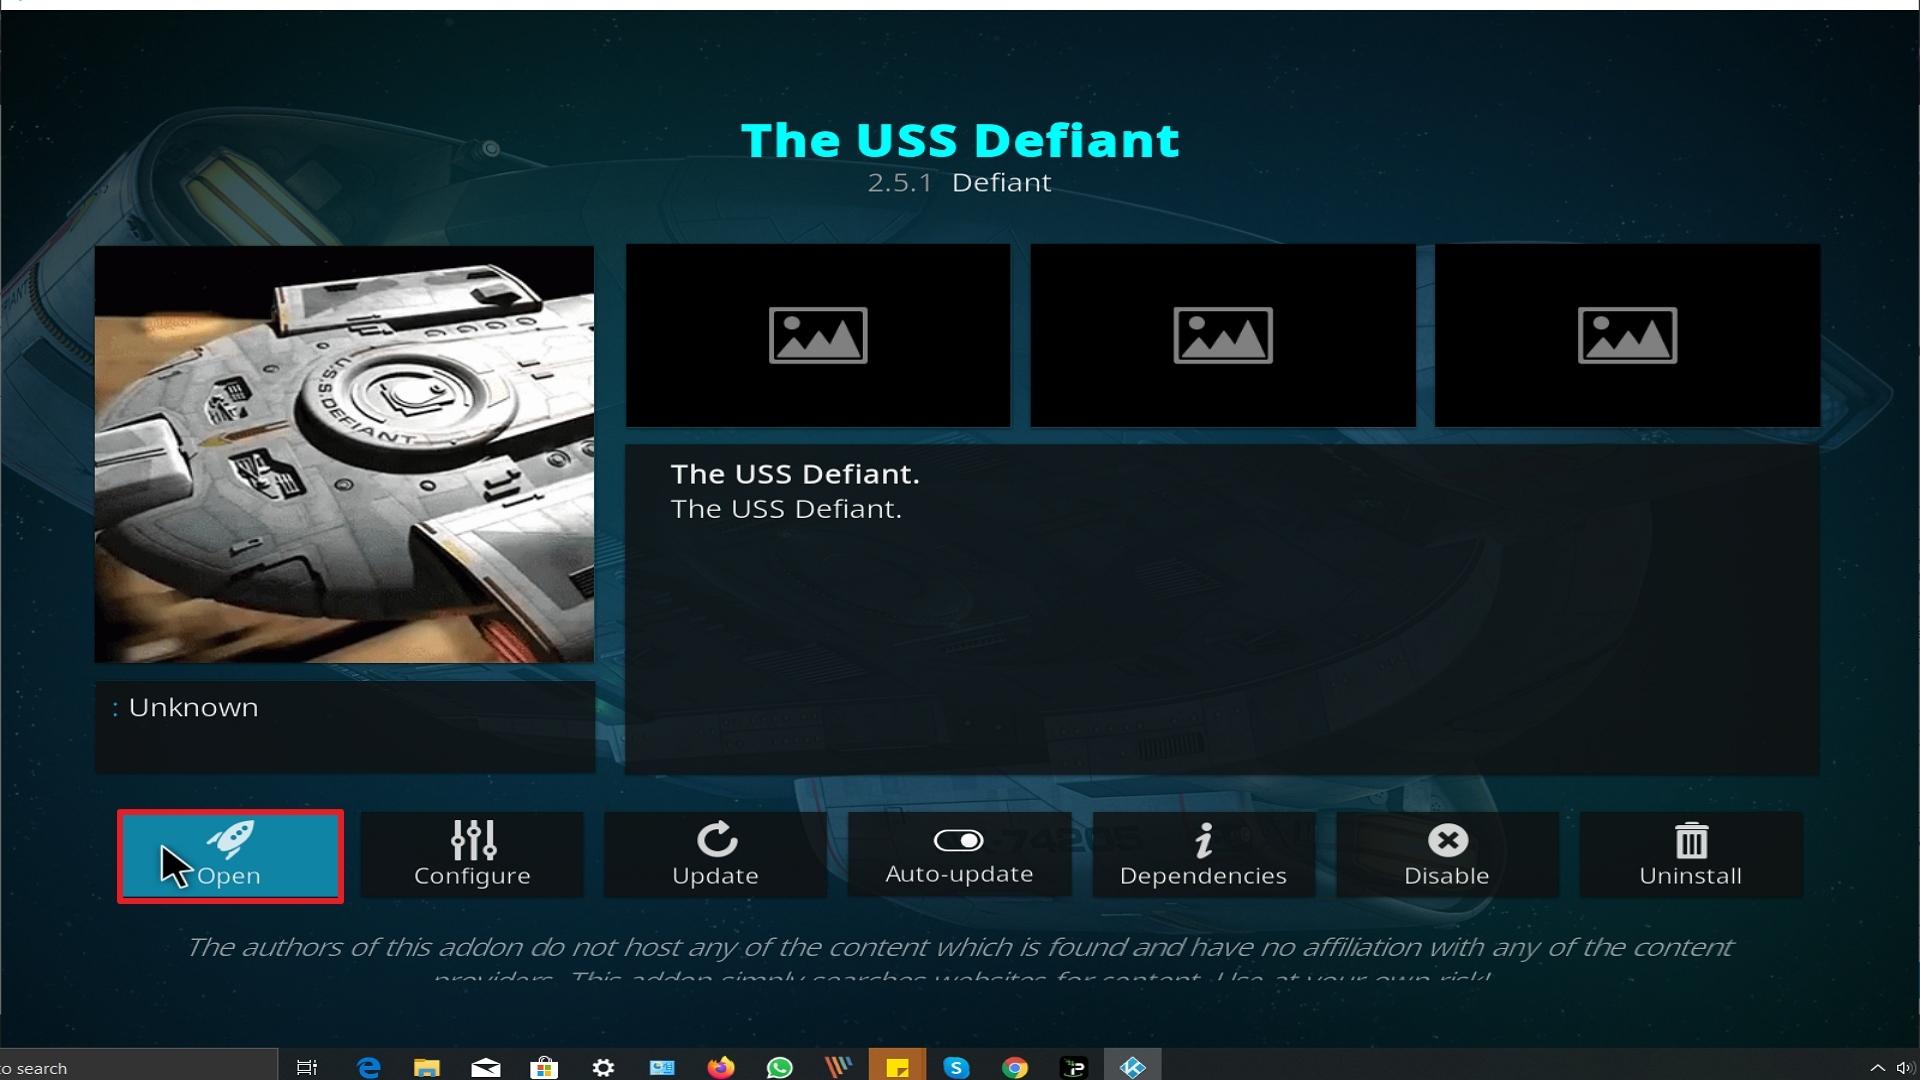 Step 26 Installing The Uss Defiant addon on Kodi